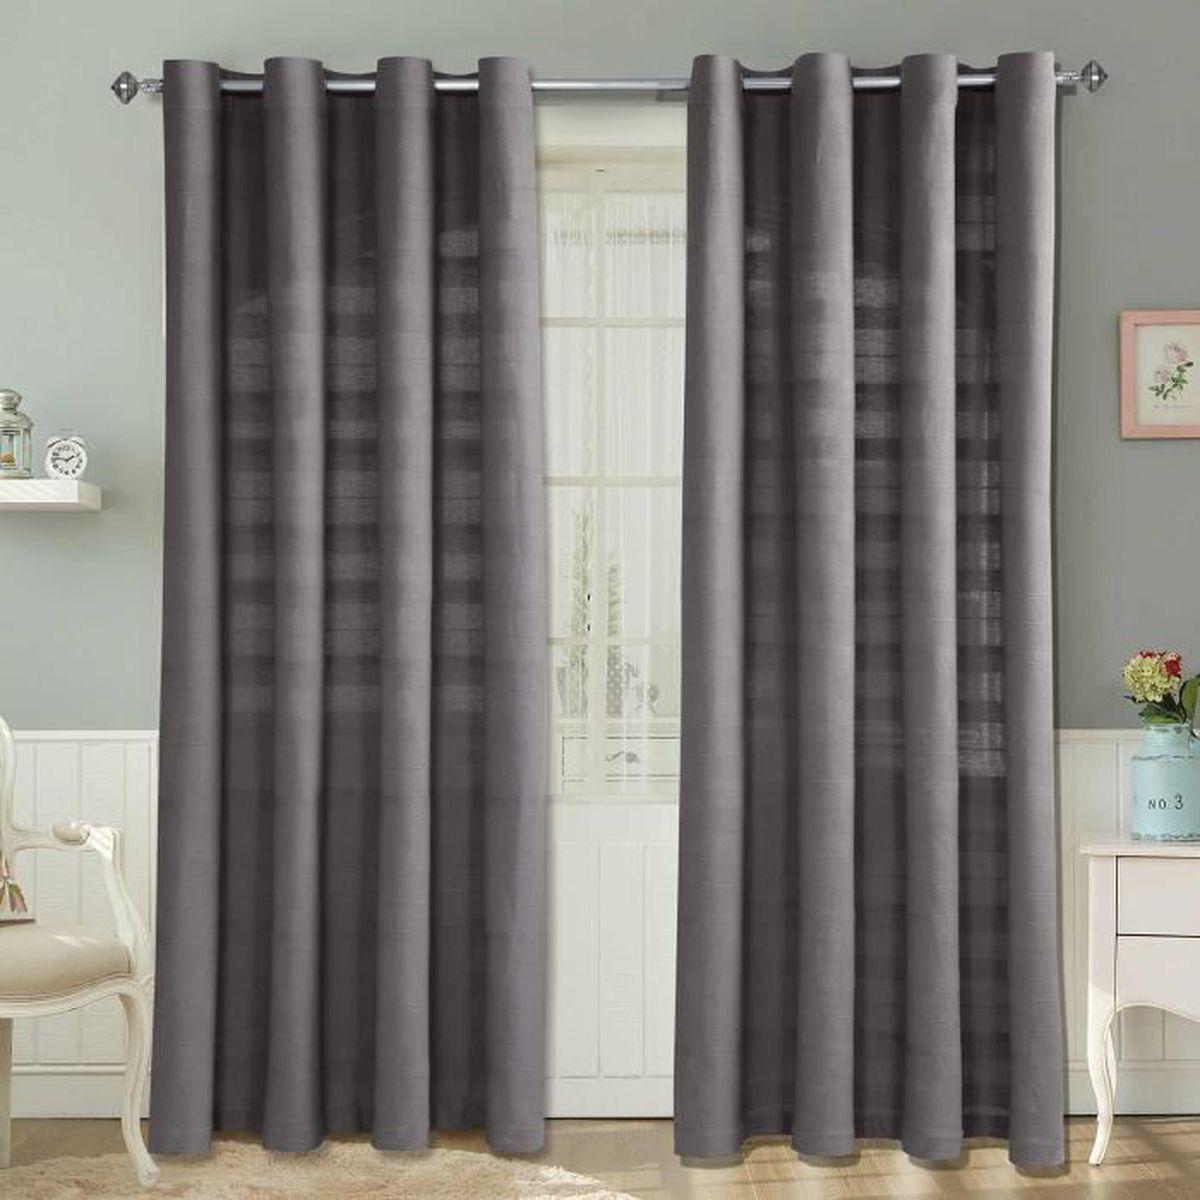 rideau moderne achat vente rideau moderne pas cher cdiscount. Black Bedroom Furniture Sets. Home Design Ideas